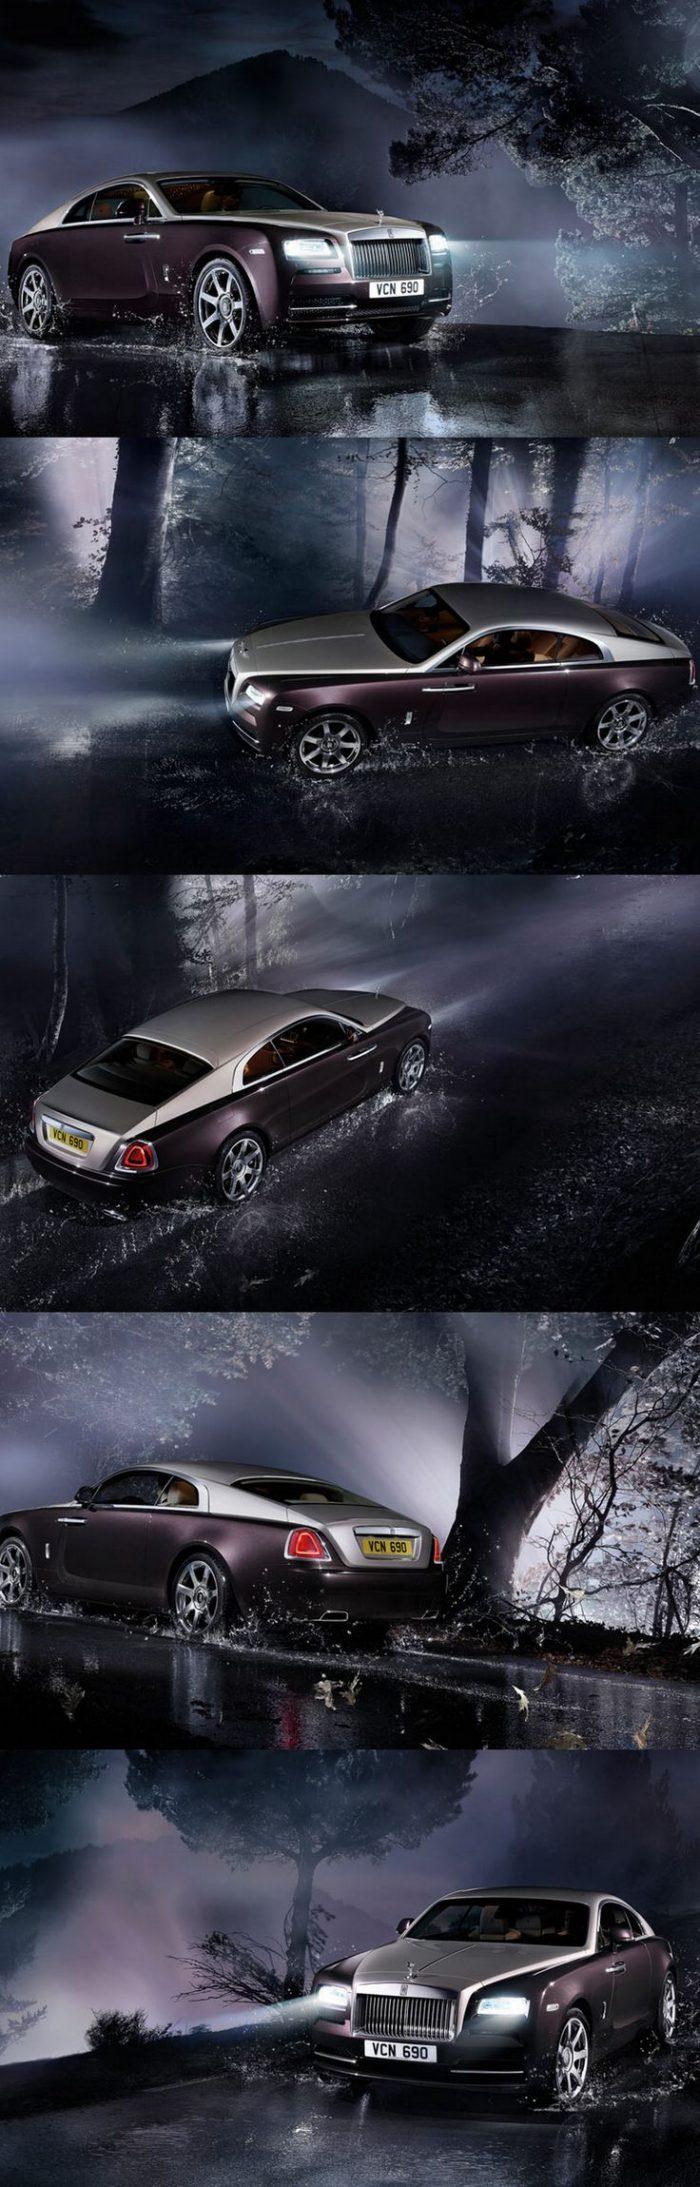 Rolls Royce, Marzenie